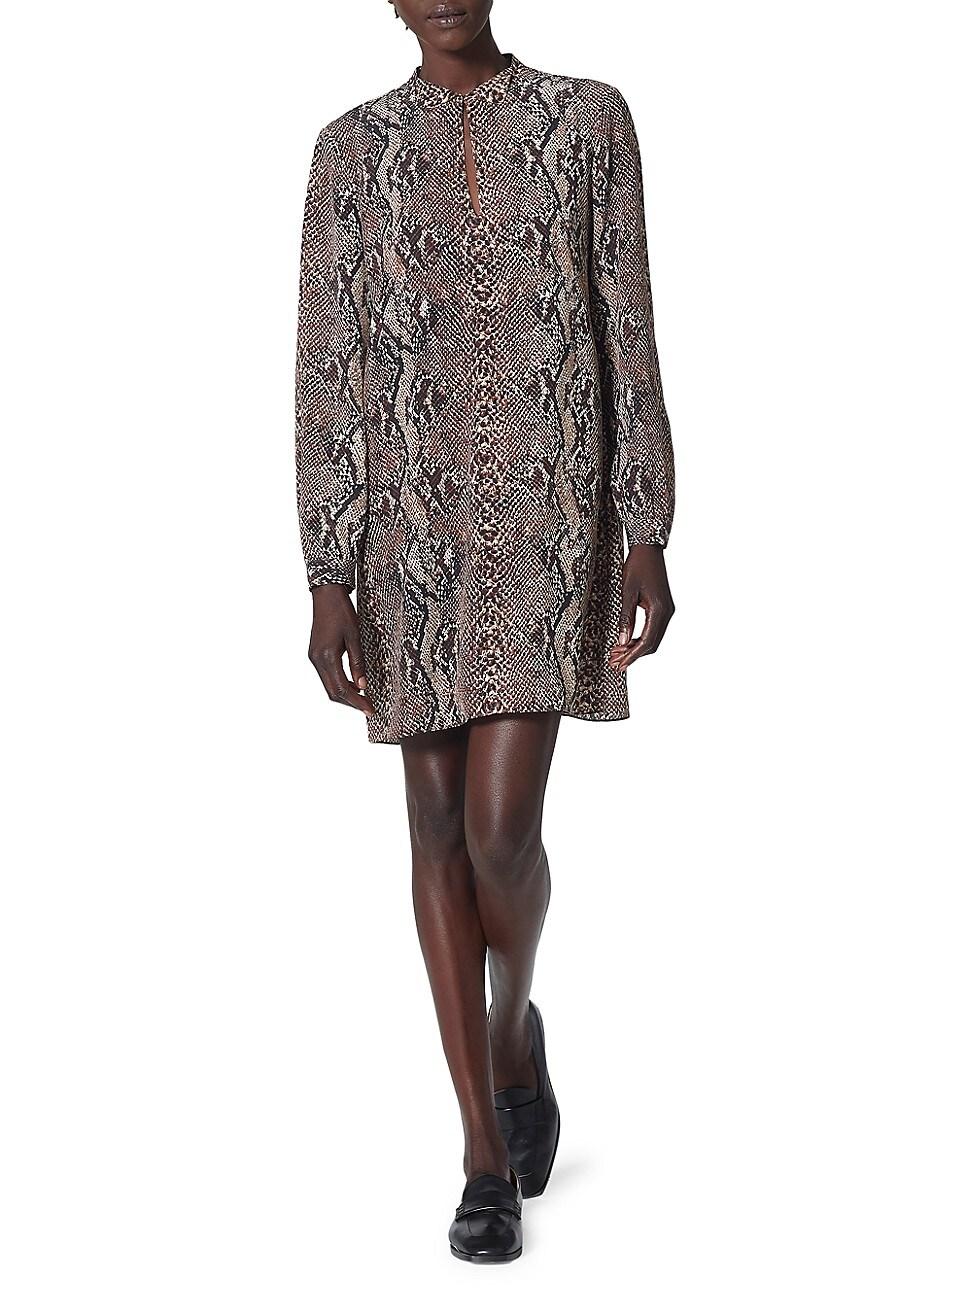 Joie WOMEN'S BRIONA SILK SHIFT DRESS